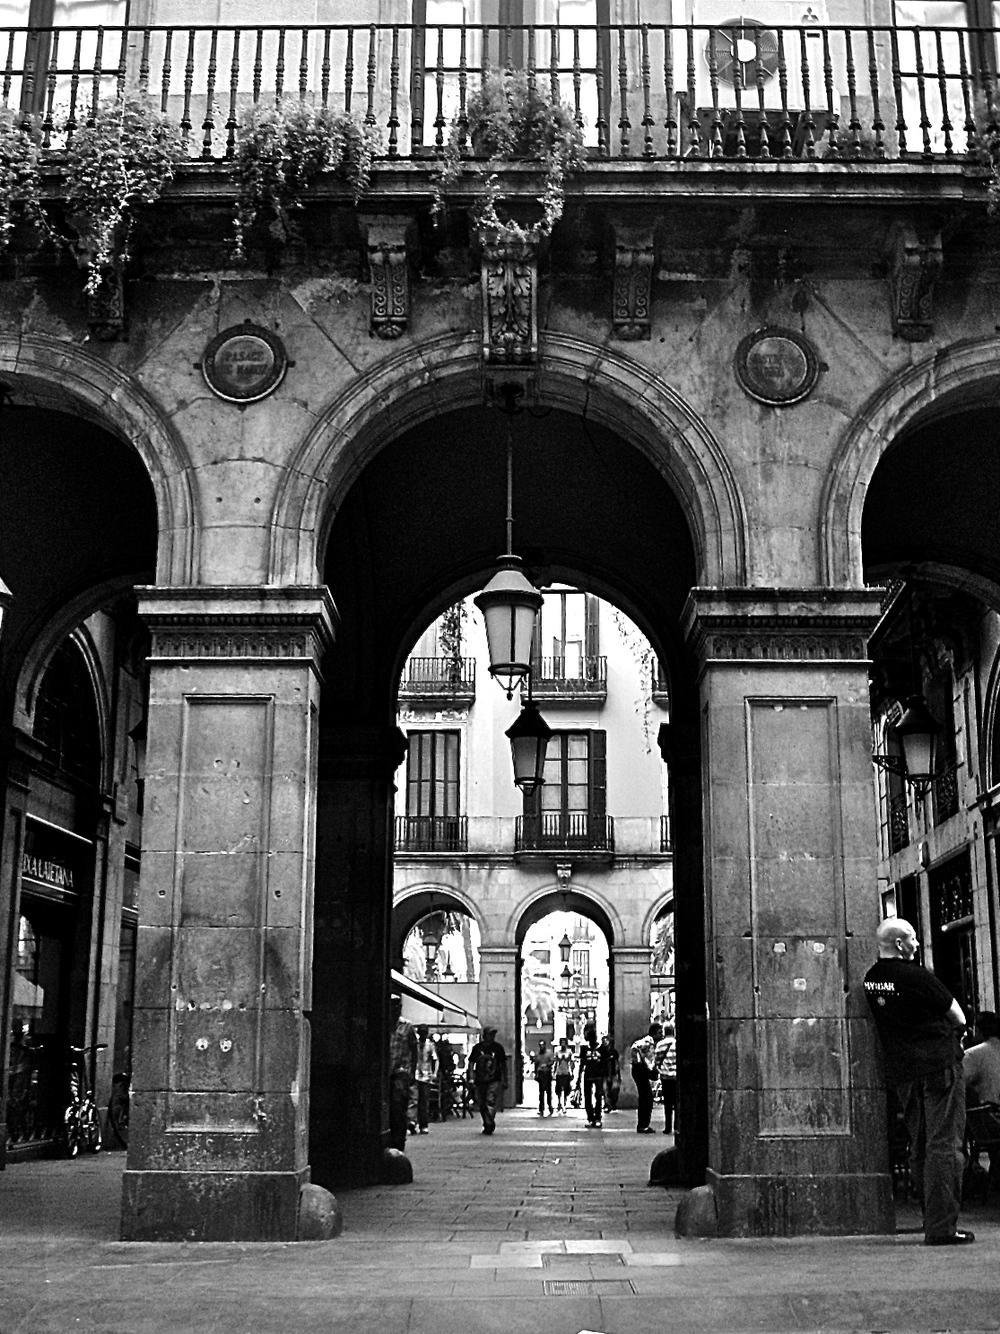 BarcelonaParis_Sept2008_219.JPG